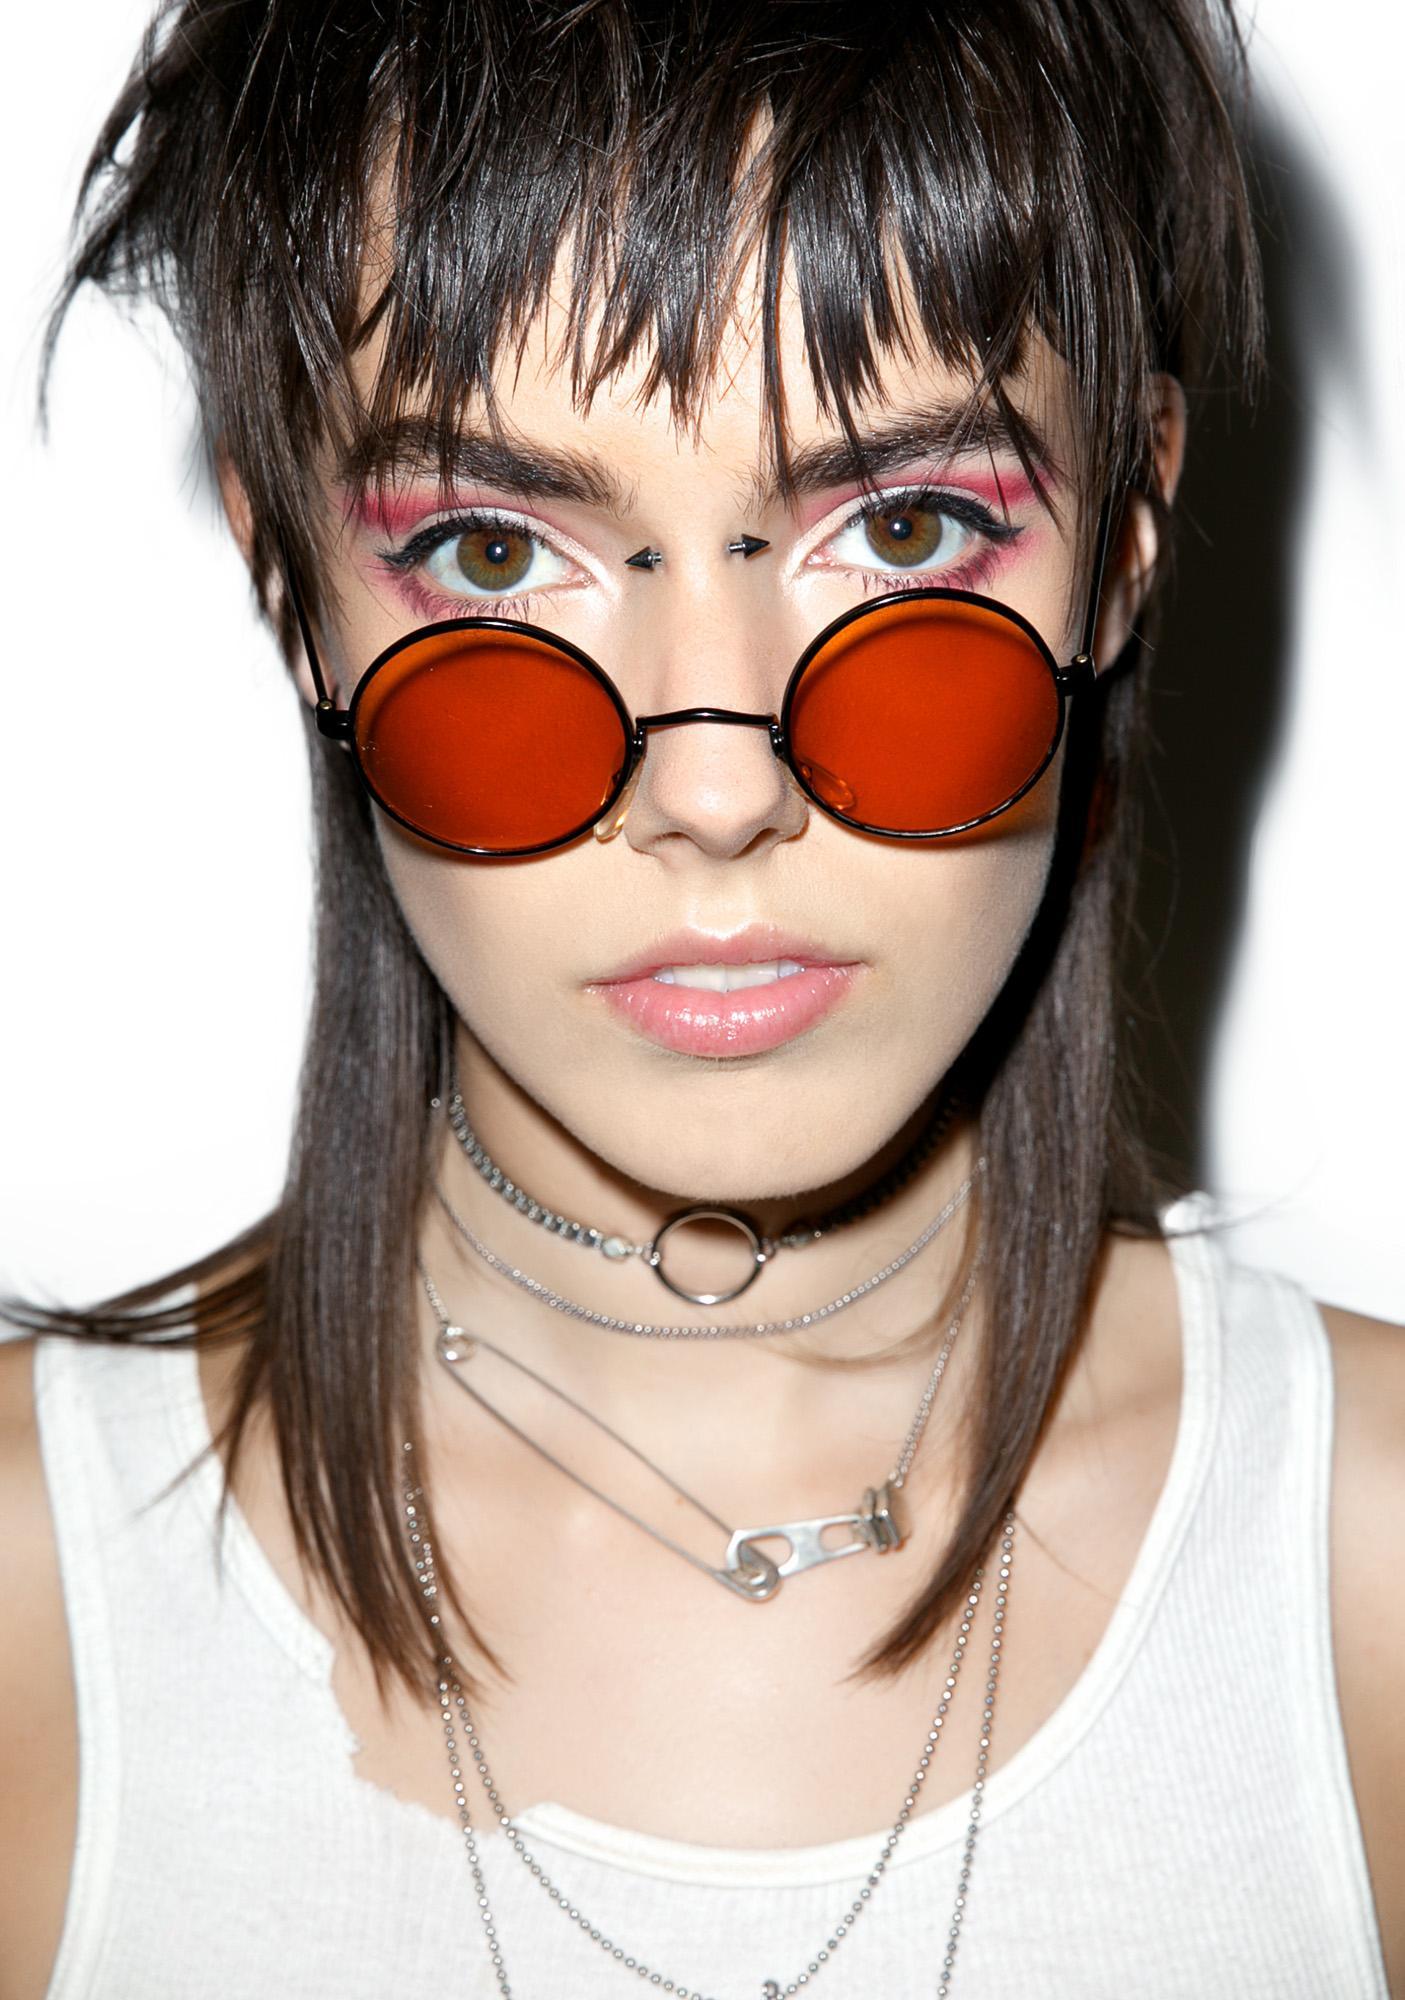 Throwback BB Sunglasses